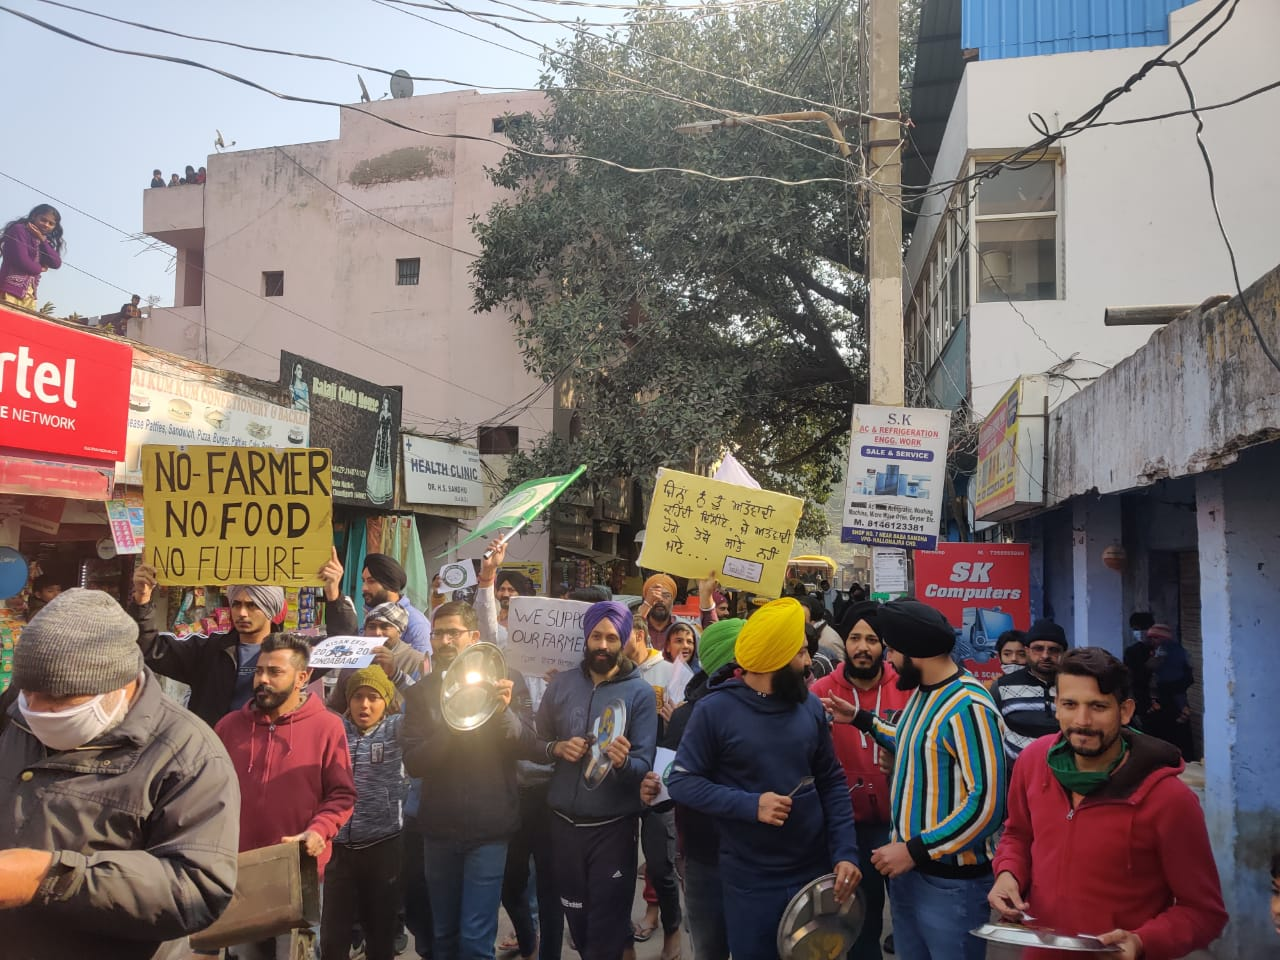 Farmers protest against farm laws 2020: Amid farmers' call for 'Thali challenge', Prime Minister Narendra Modi addressed Mann ki Baat.